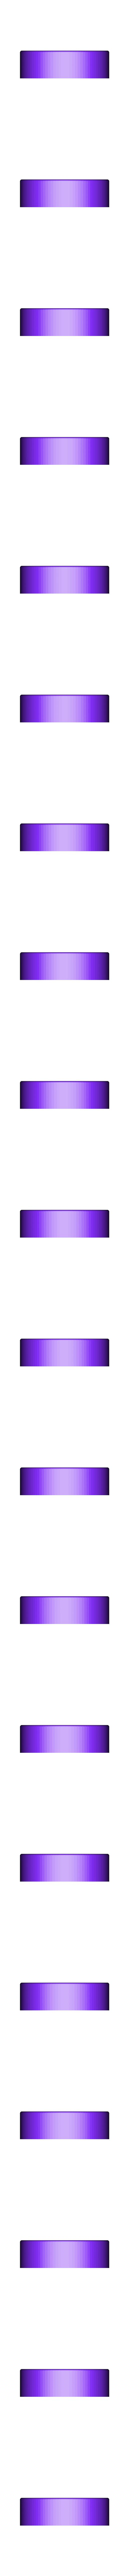 Muffin_Holder_Top.stl Télécharger fichier STL gratuit Support à muffins • Plan pour impression 3D, DraftingJake